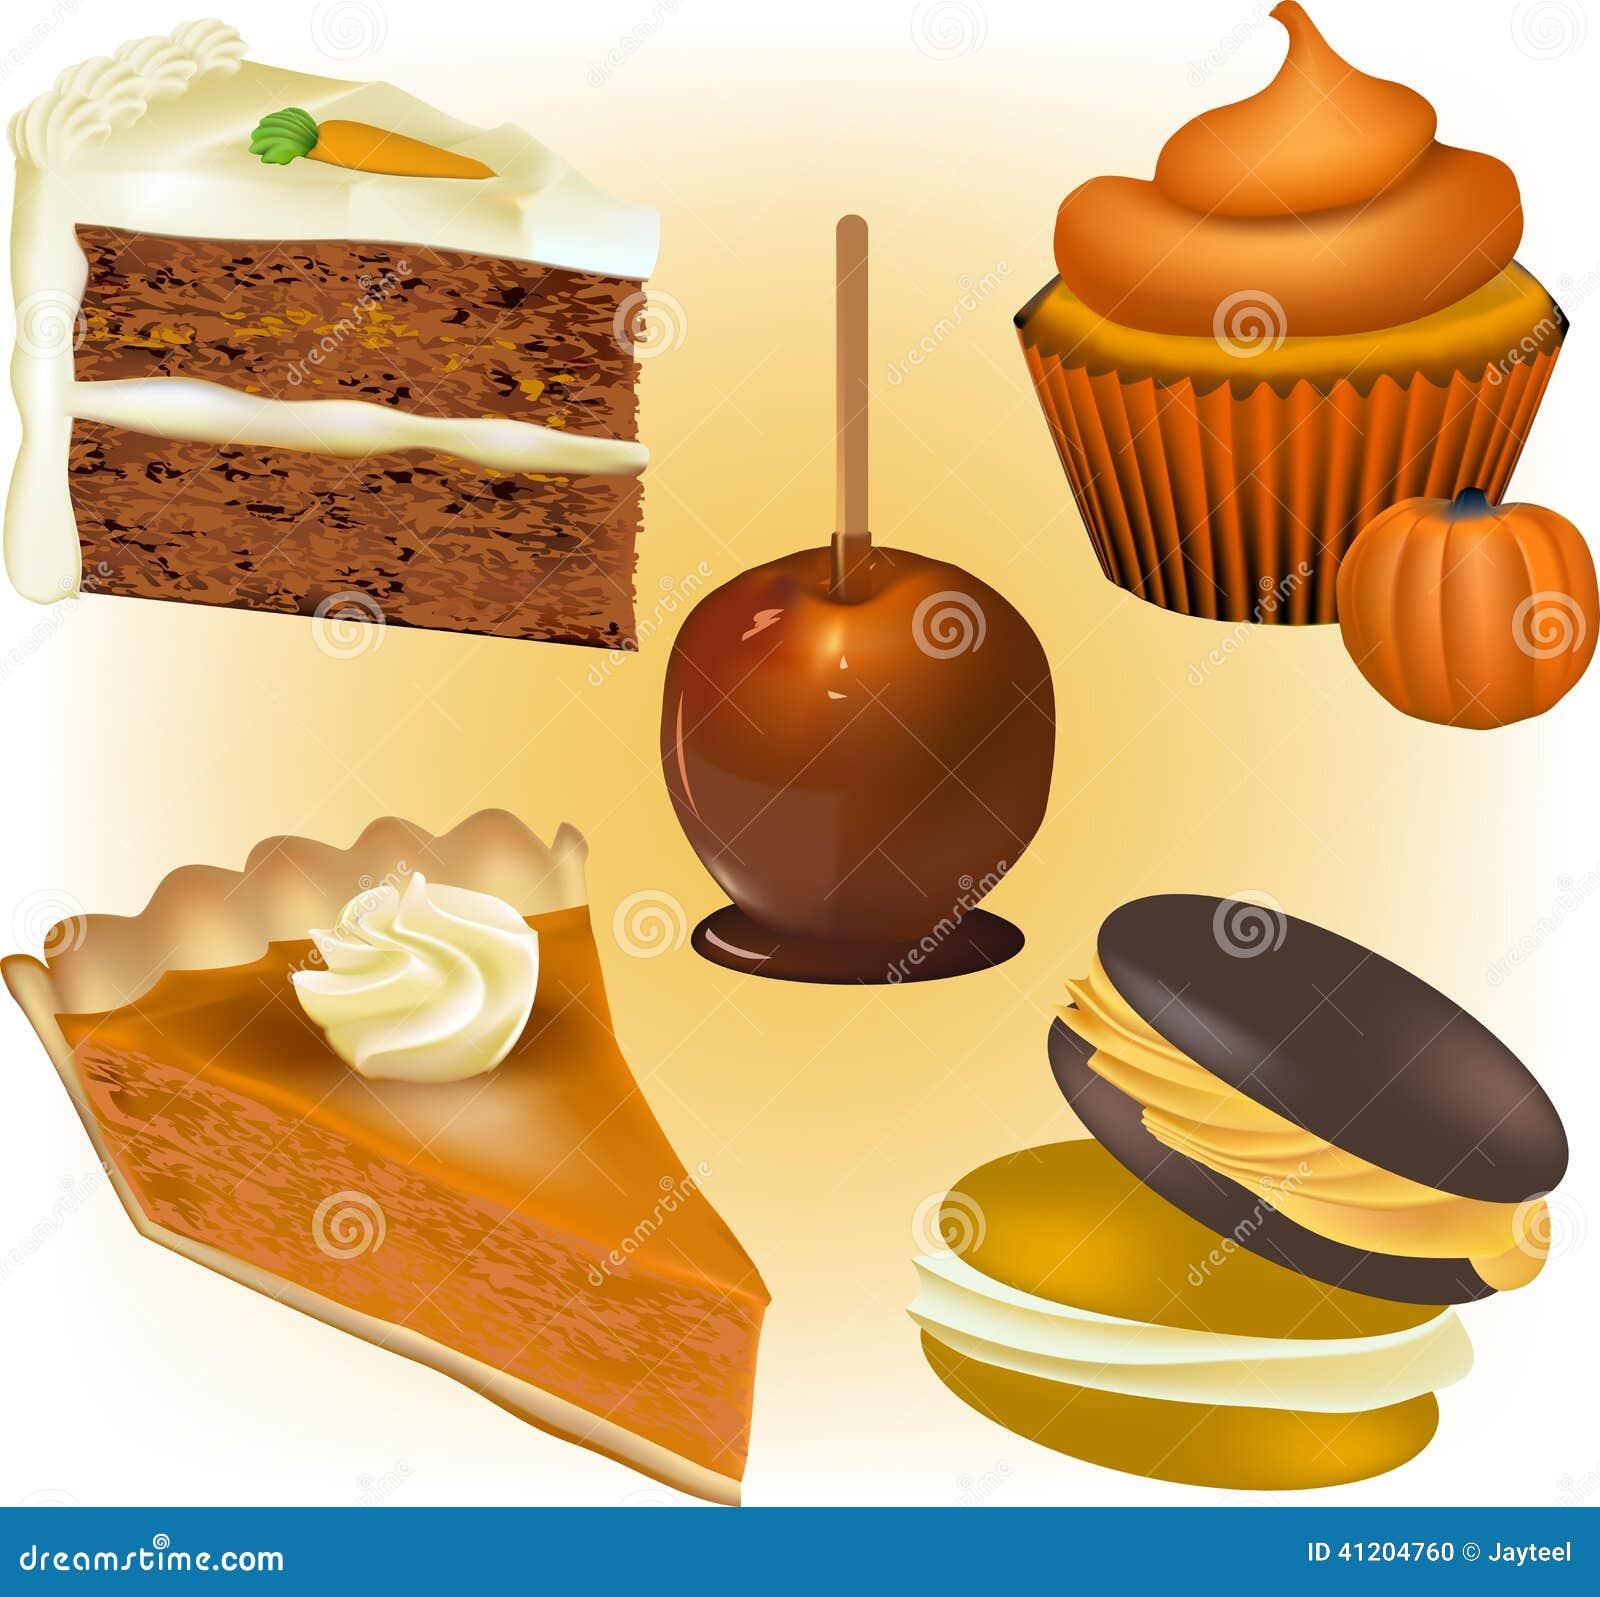 Apple And Orange Layer Cake